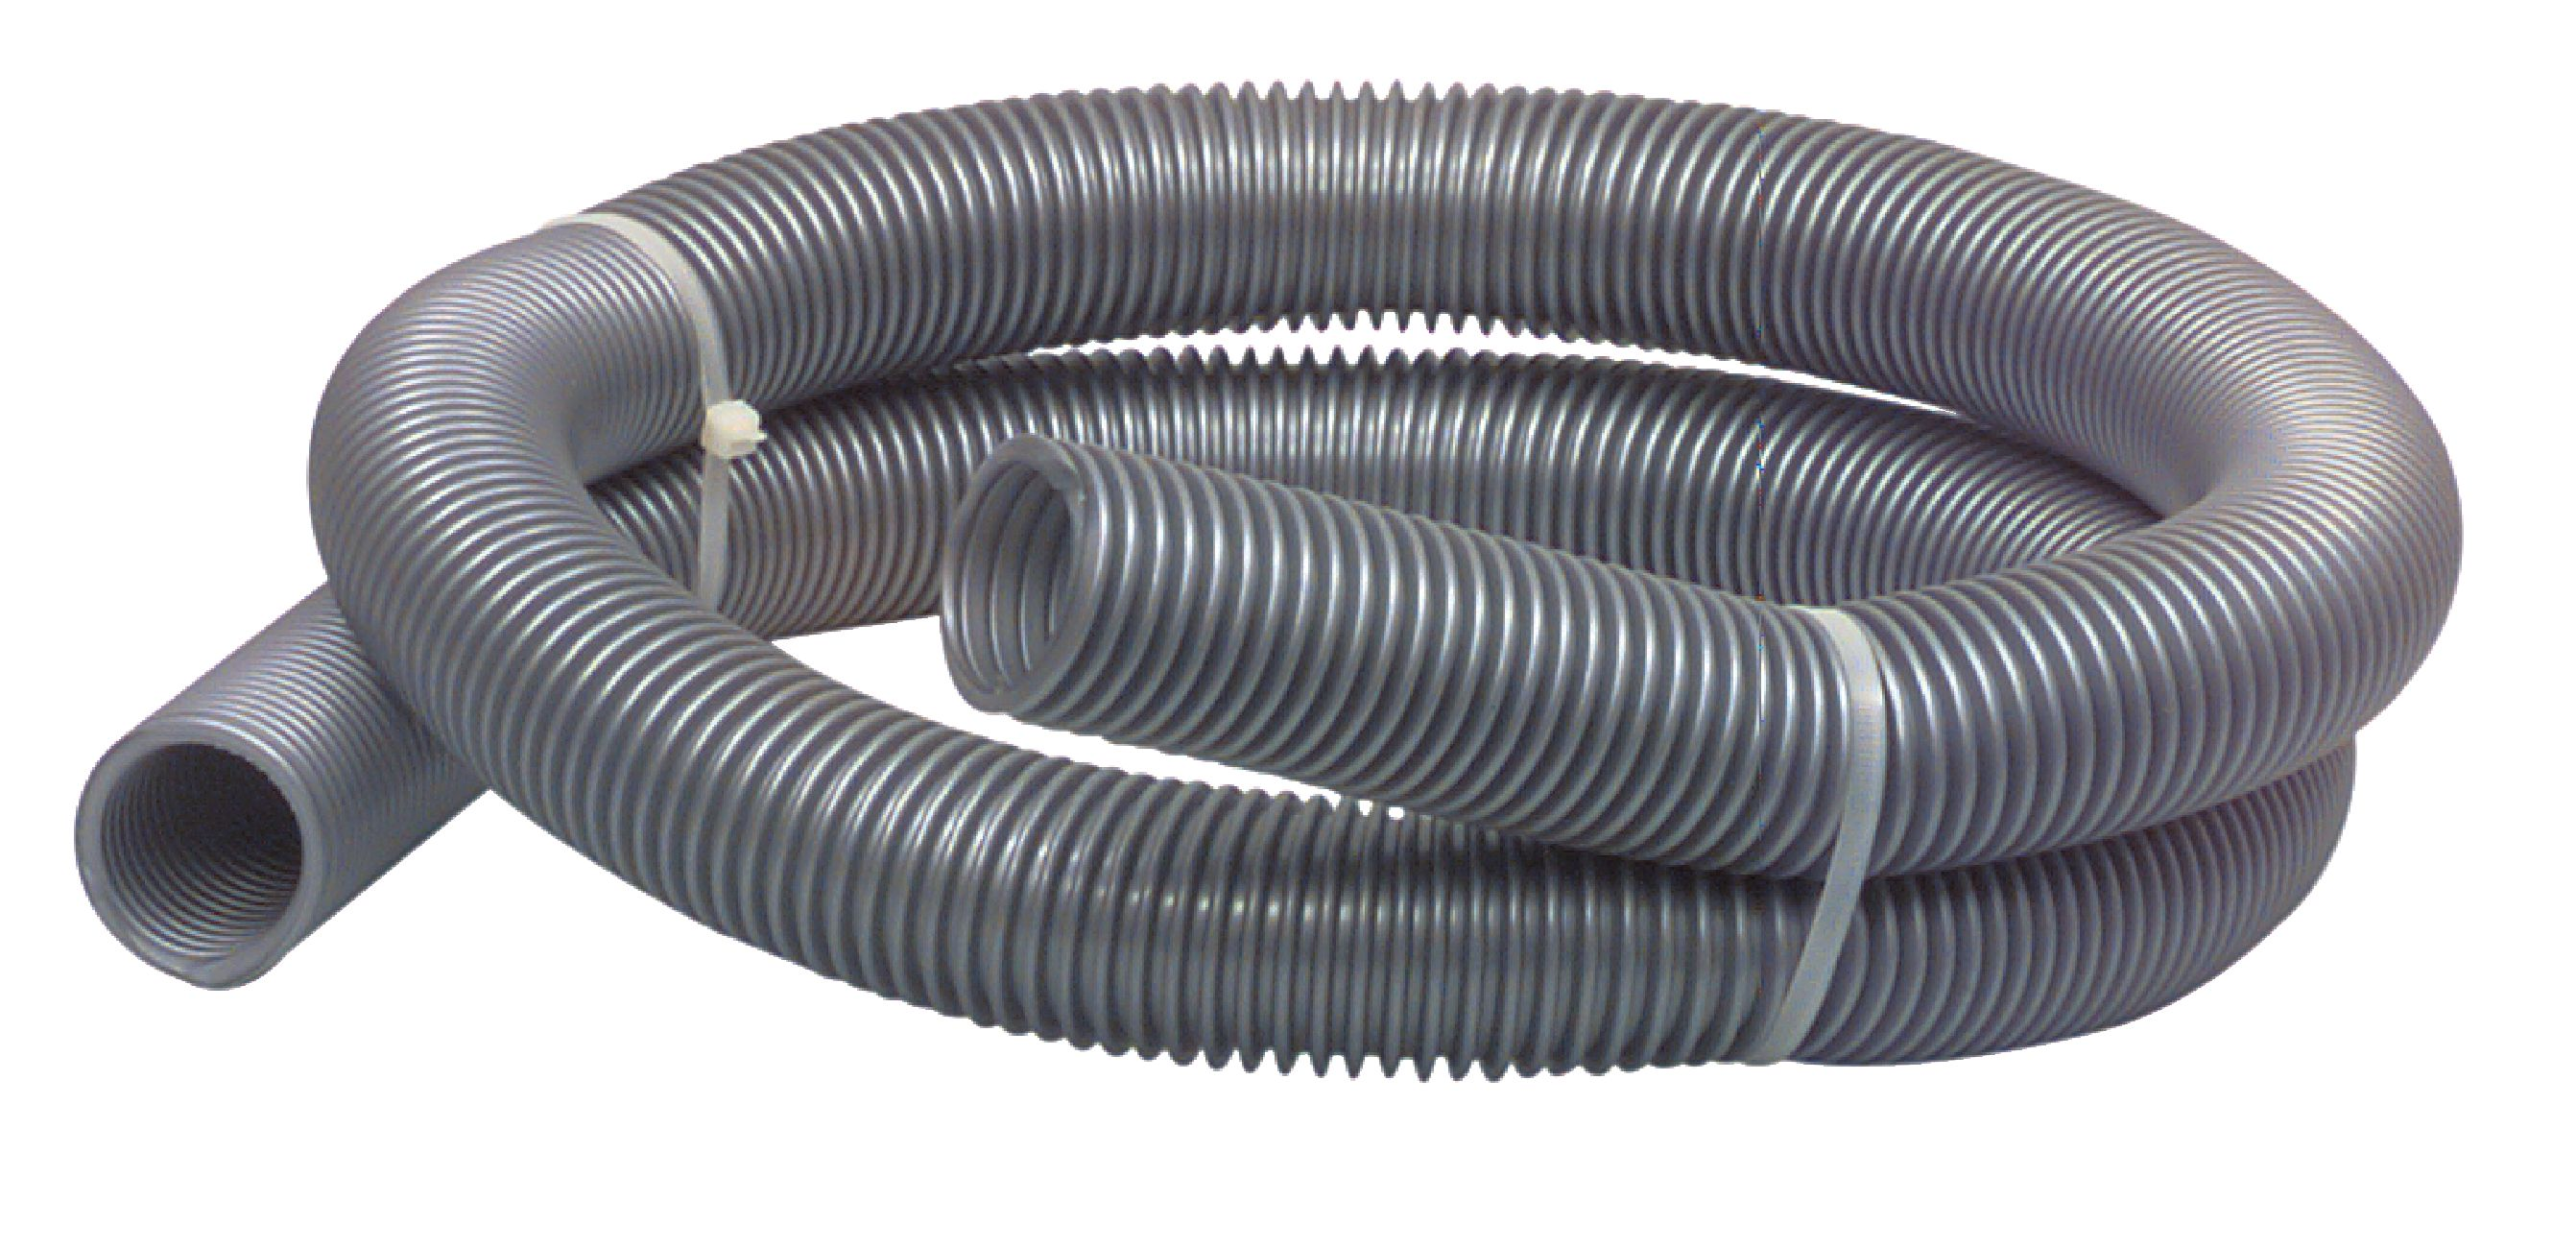 Sací hadice k vysavači 1.8 m, 32 mm